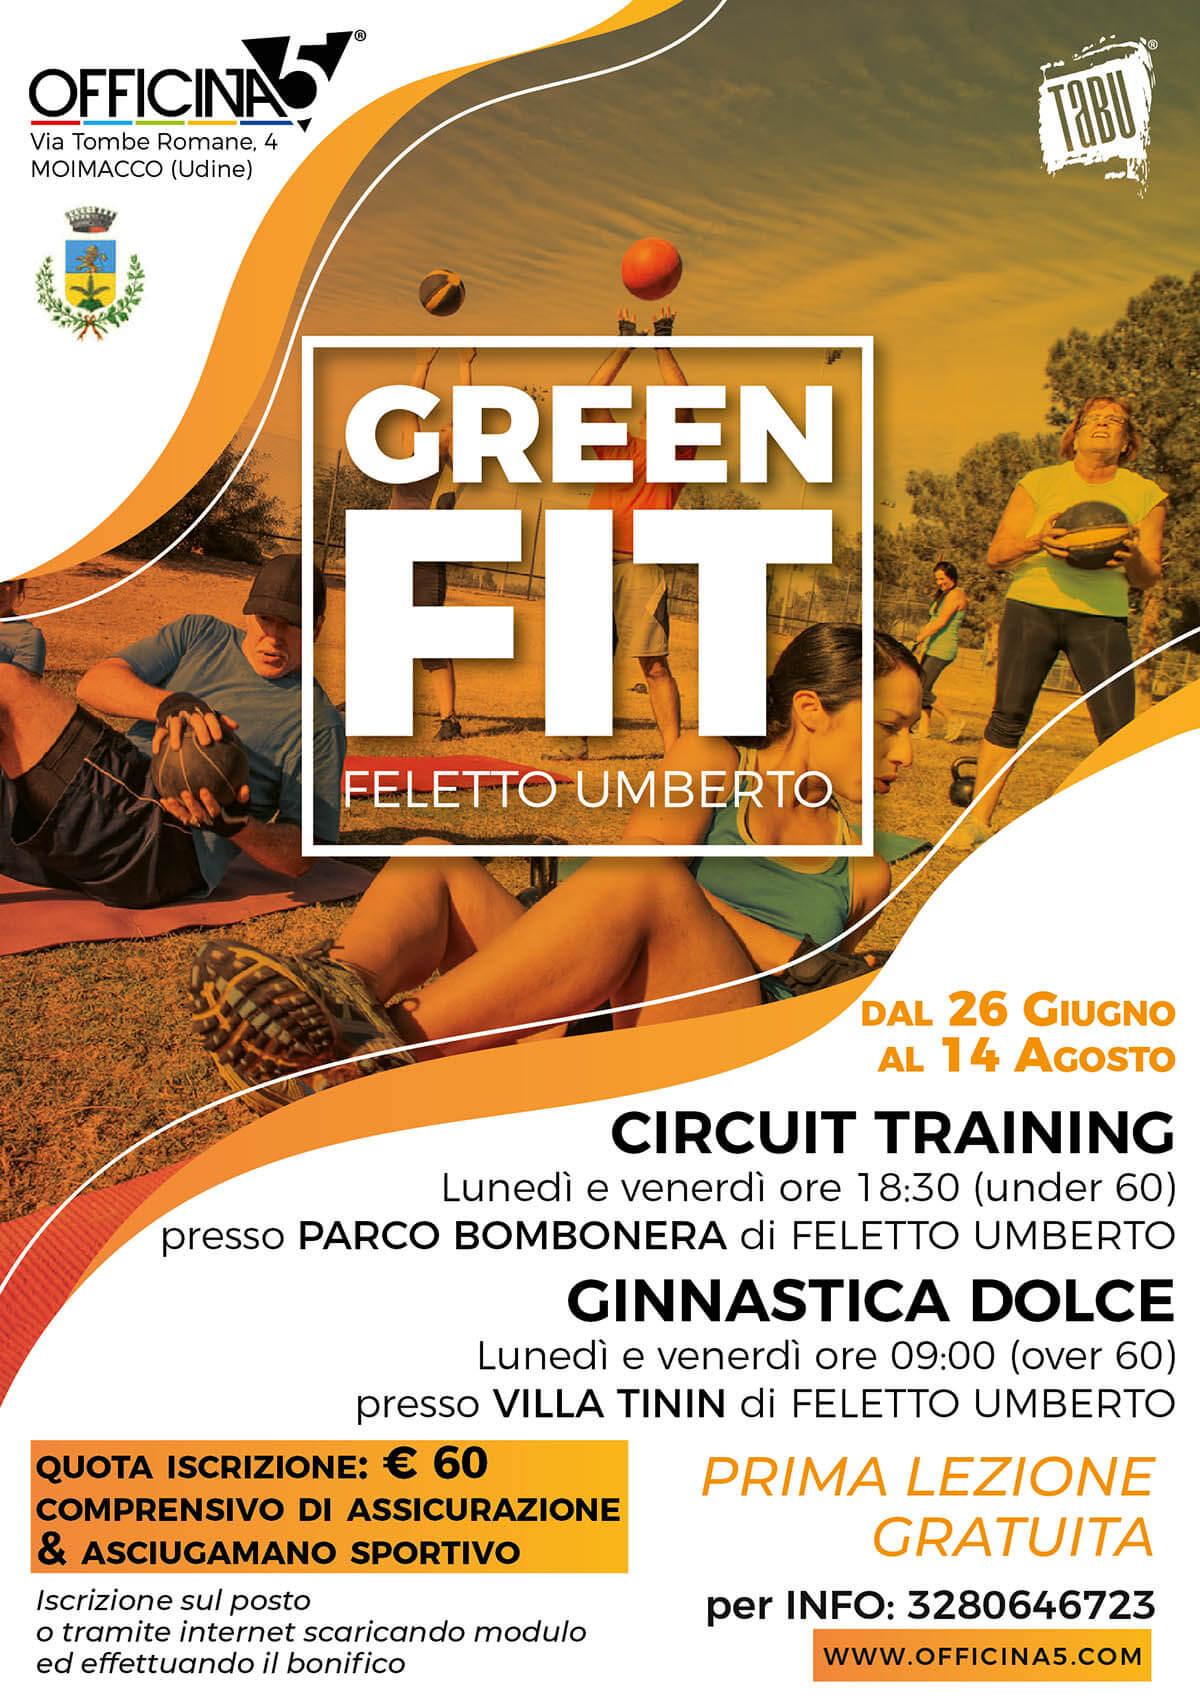 GREEN FIT - Feletto Umberto